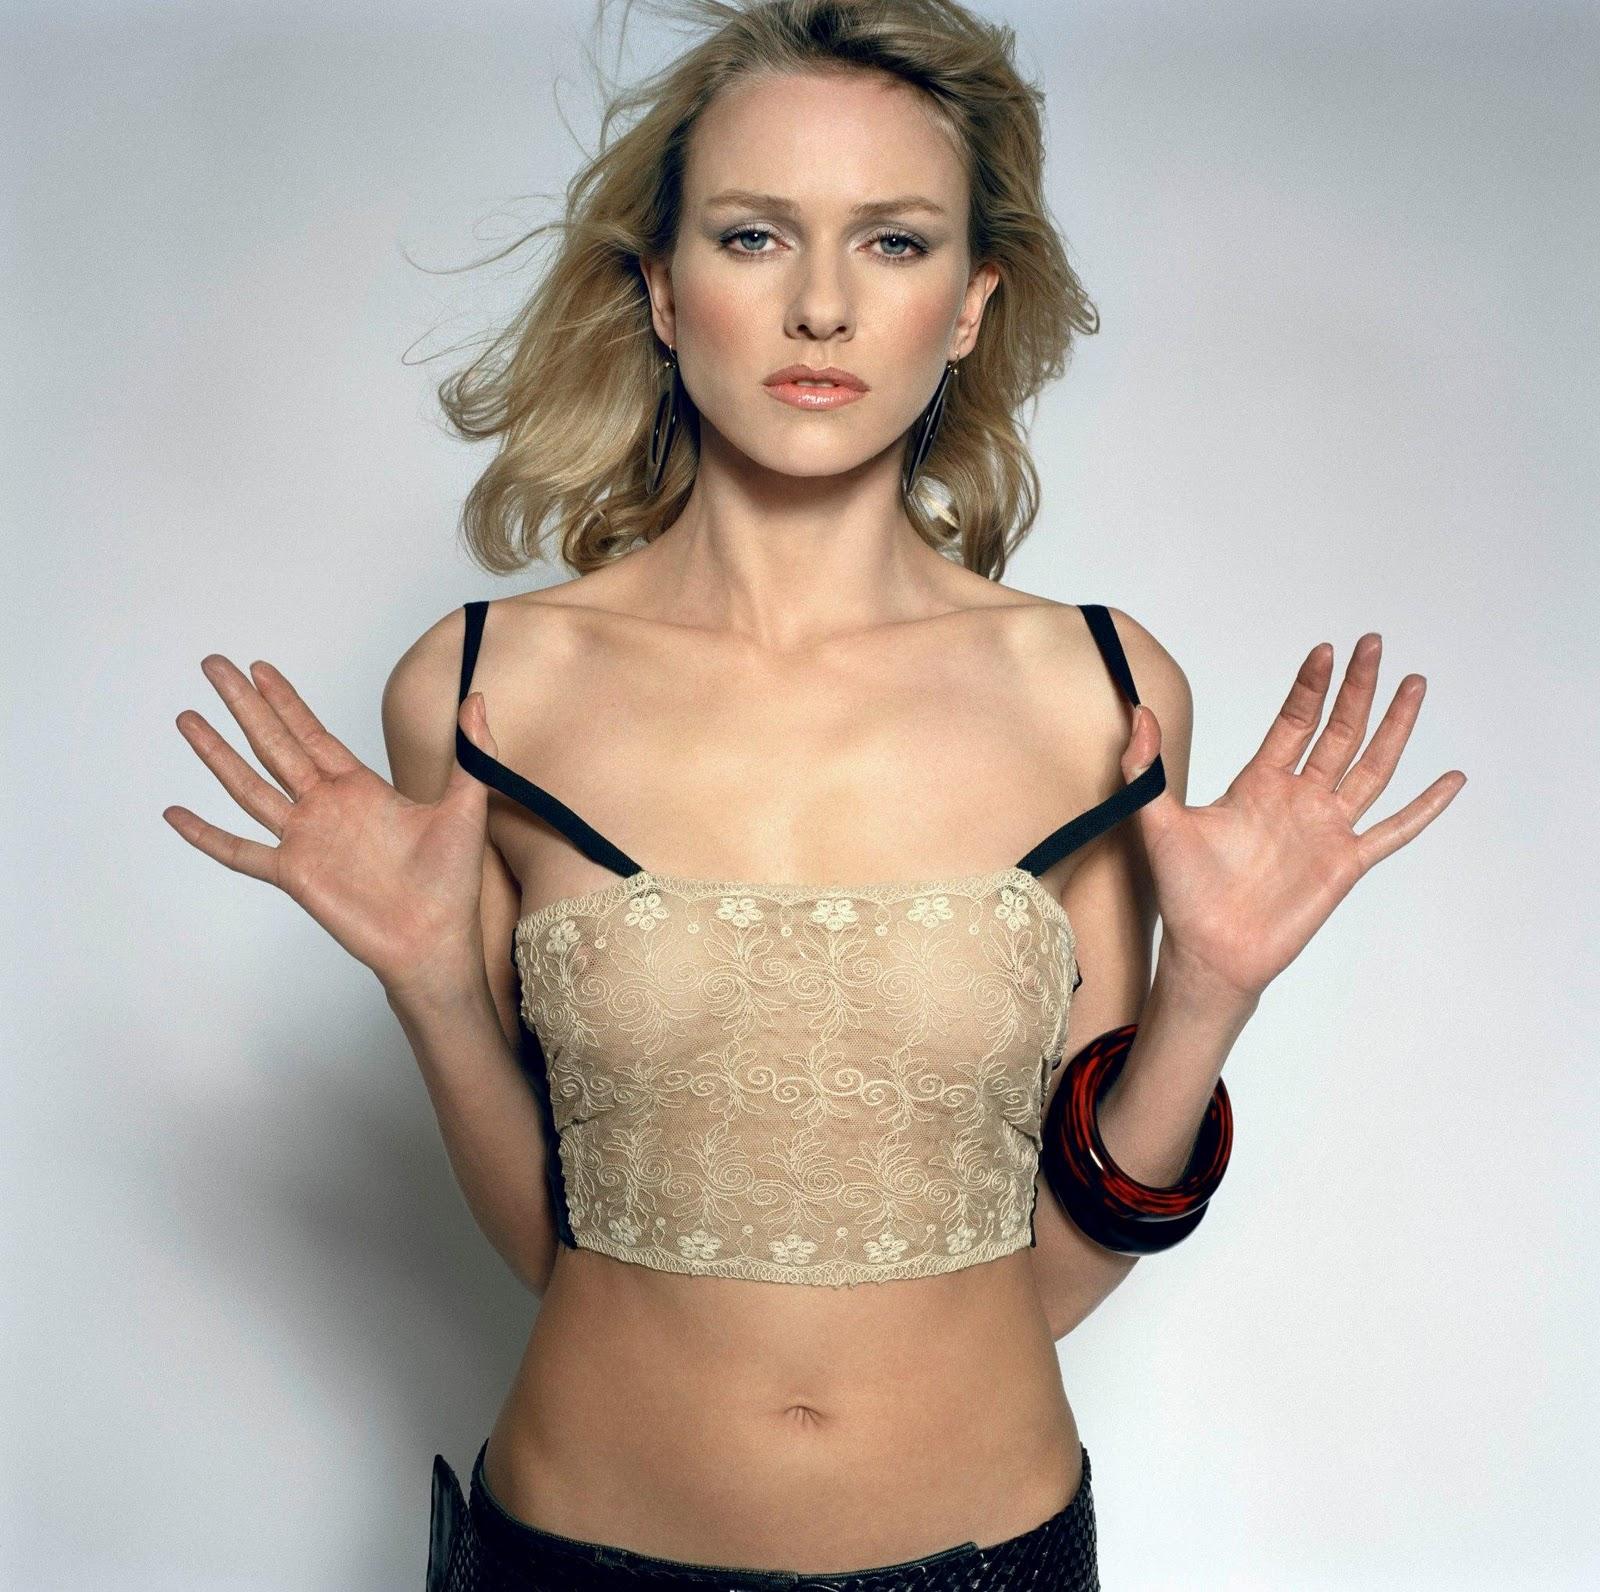 Imagefap young dominant women